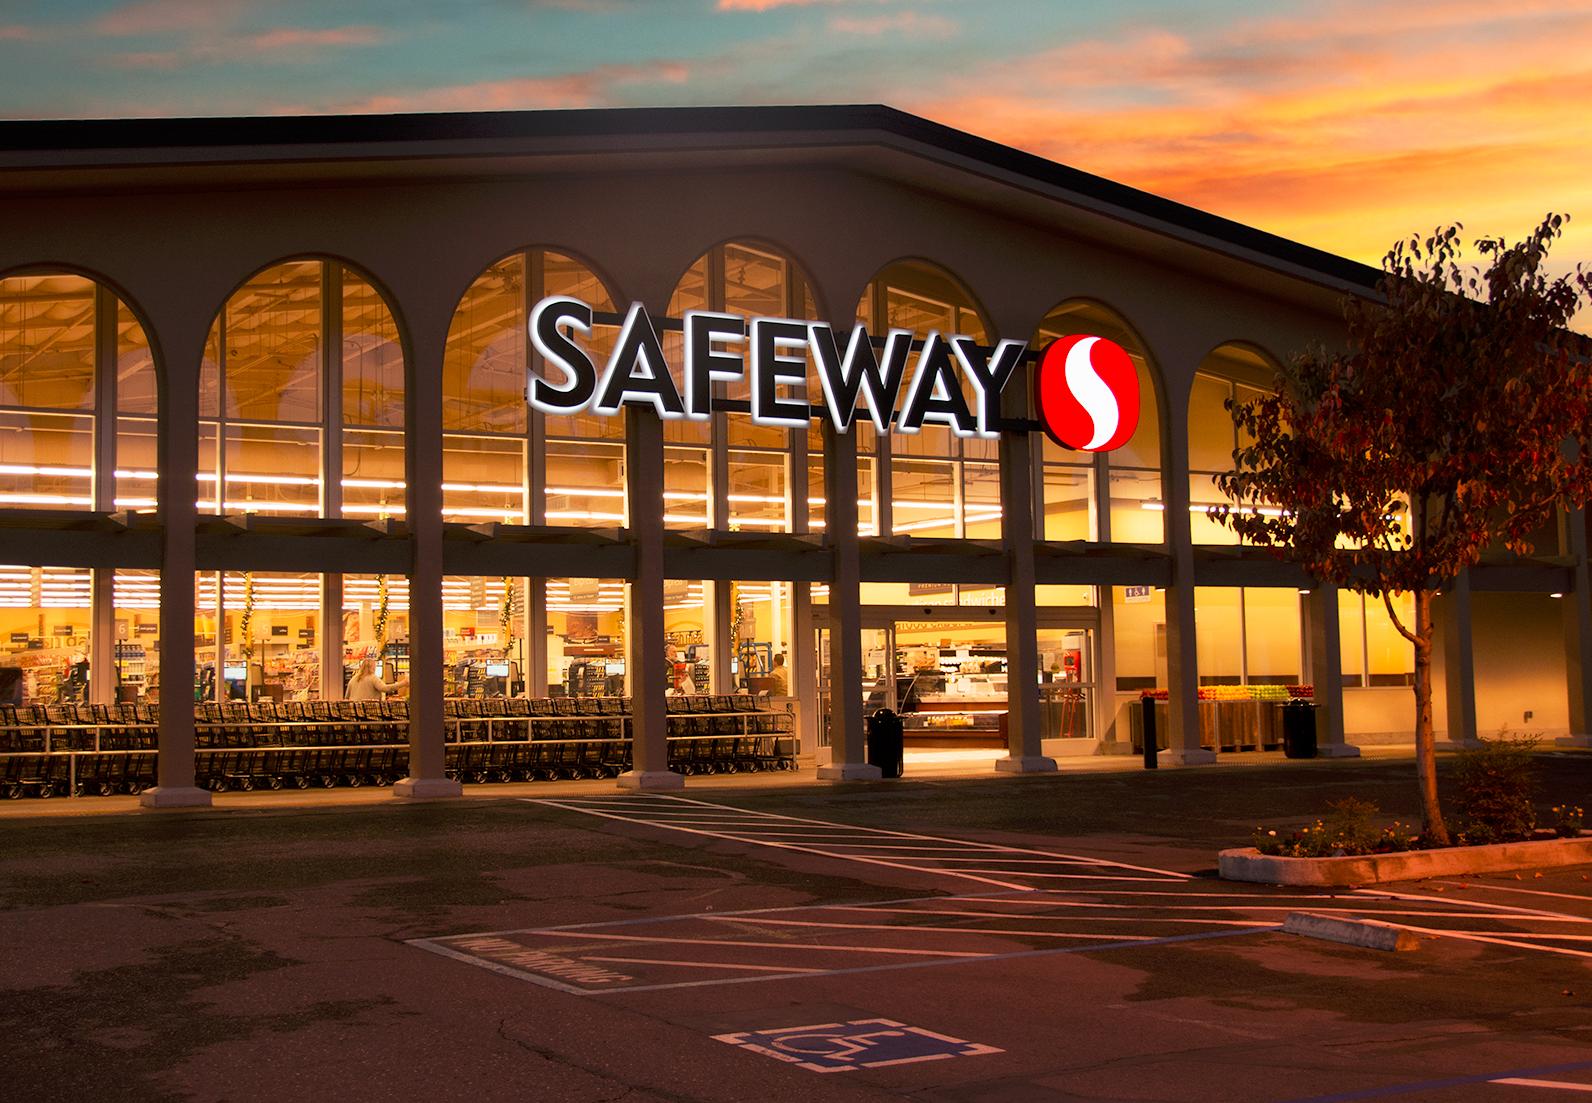 safeway2 copy